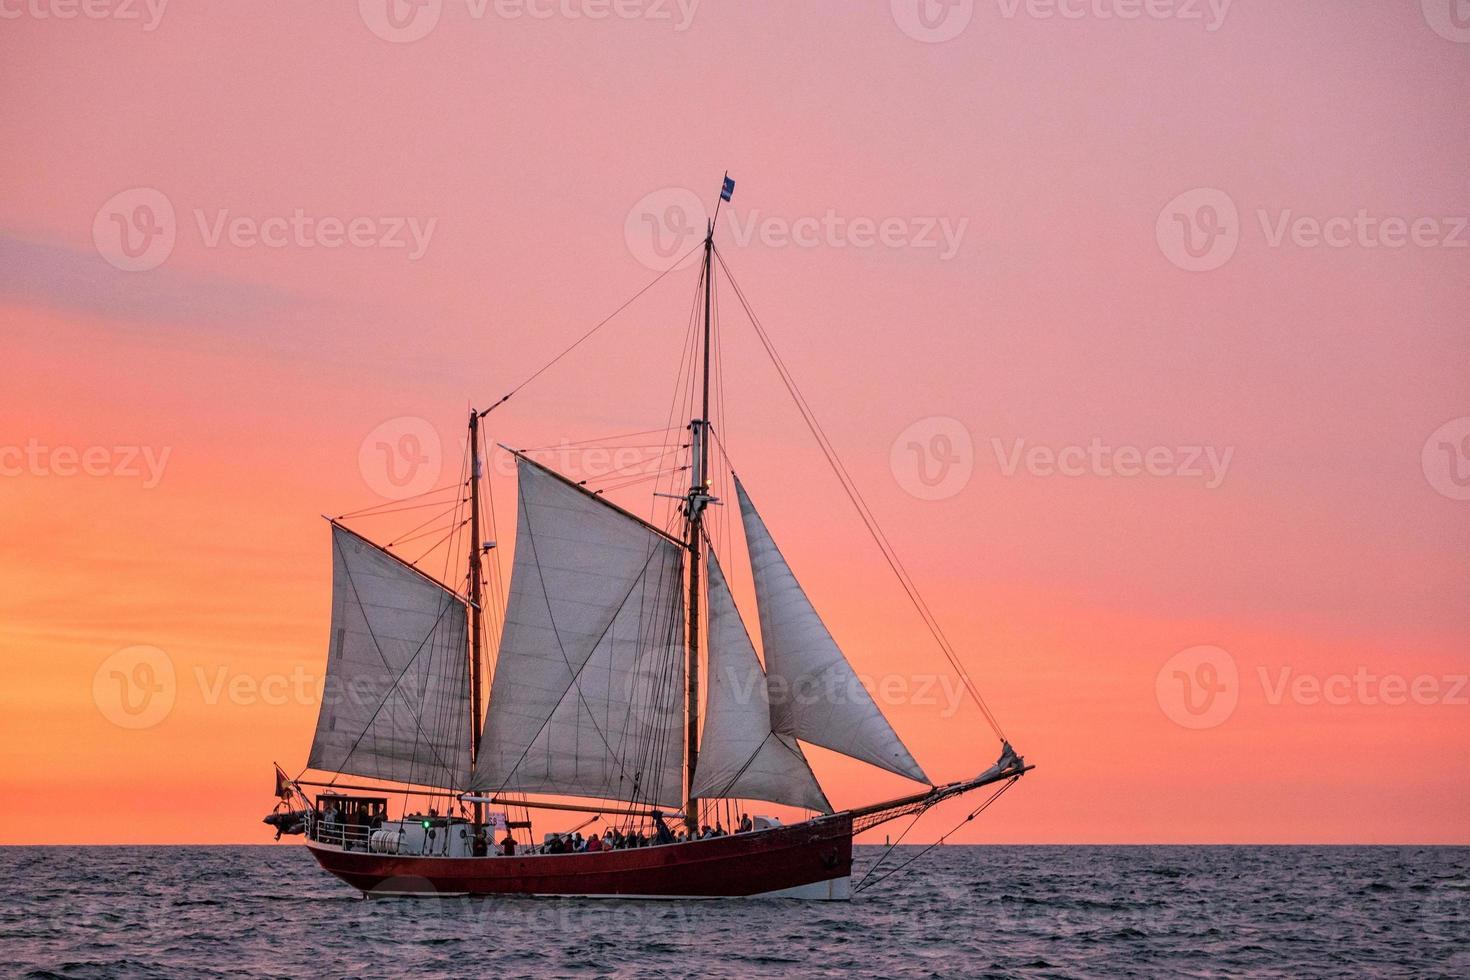 Sailing ship on the Baltic Sea photo